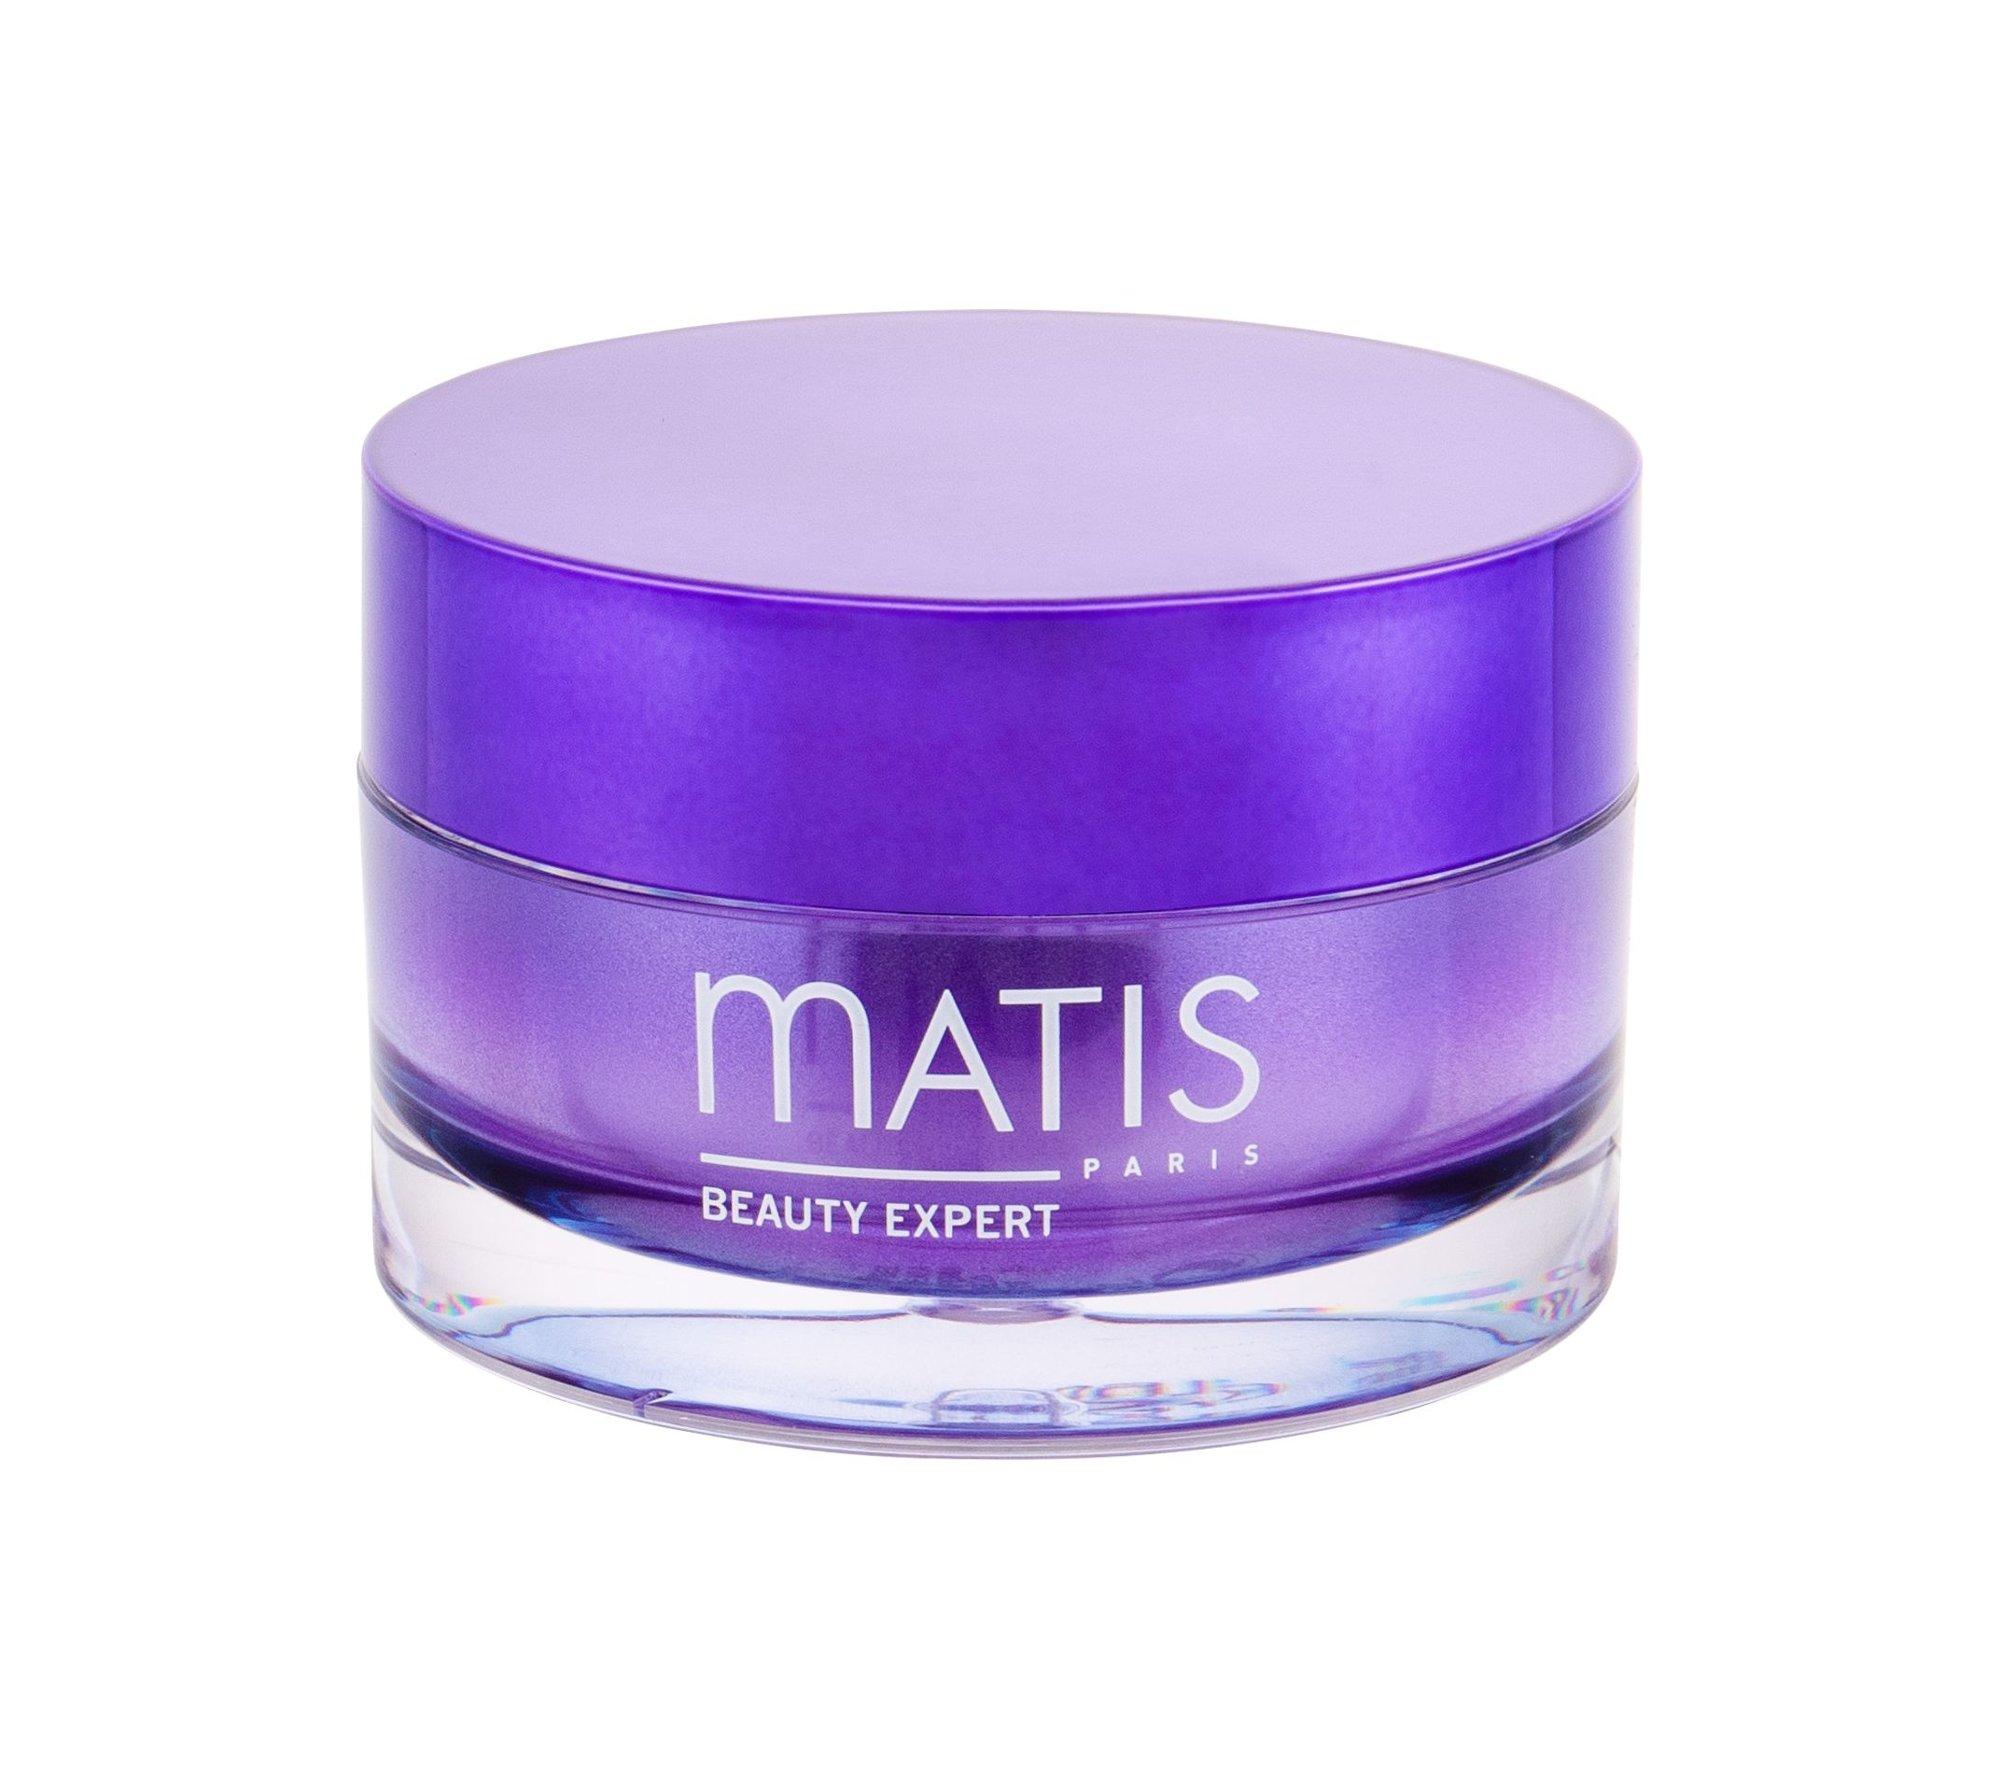 Matis Réponse Jeunesse Day Cream 50ml